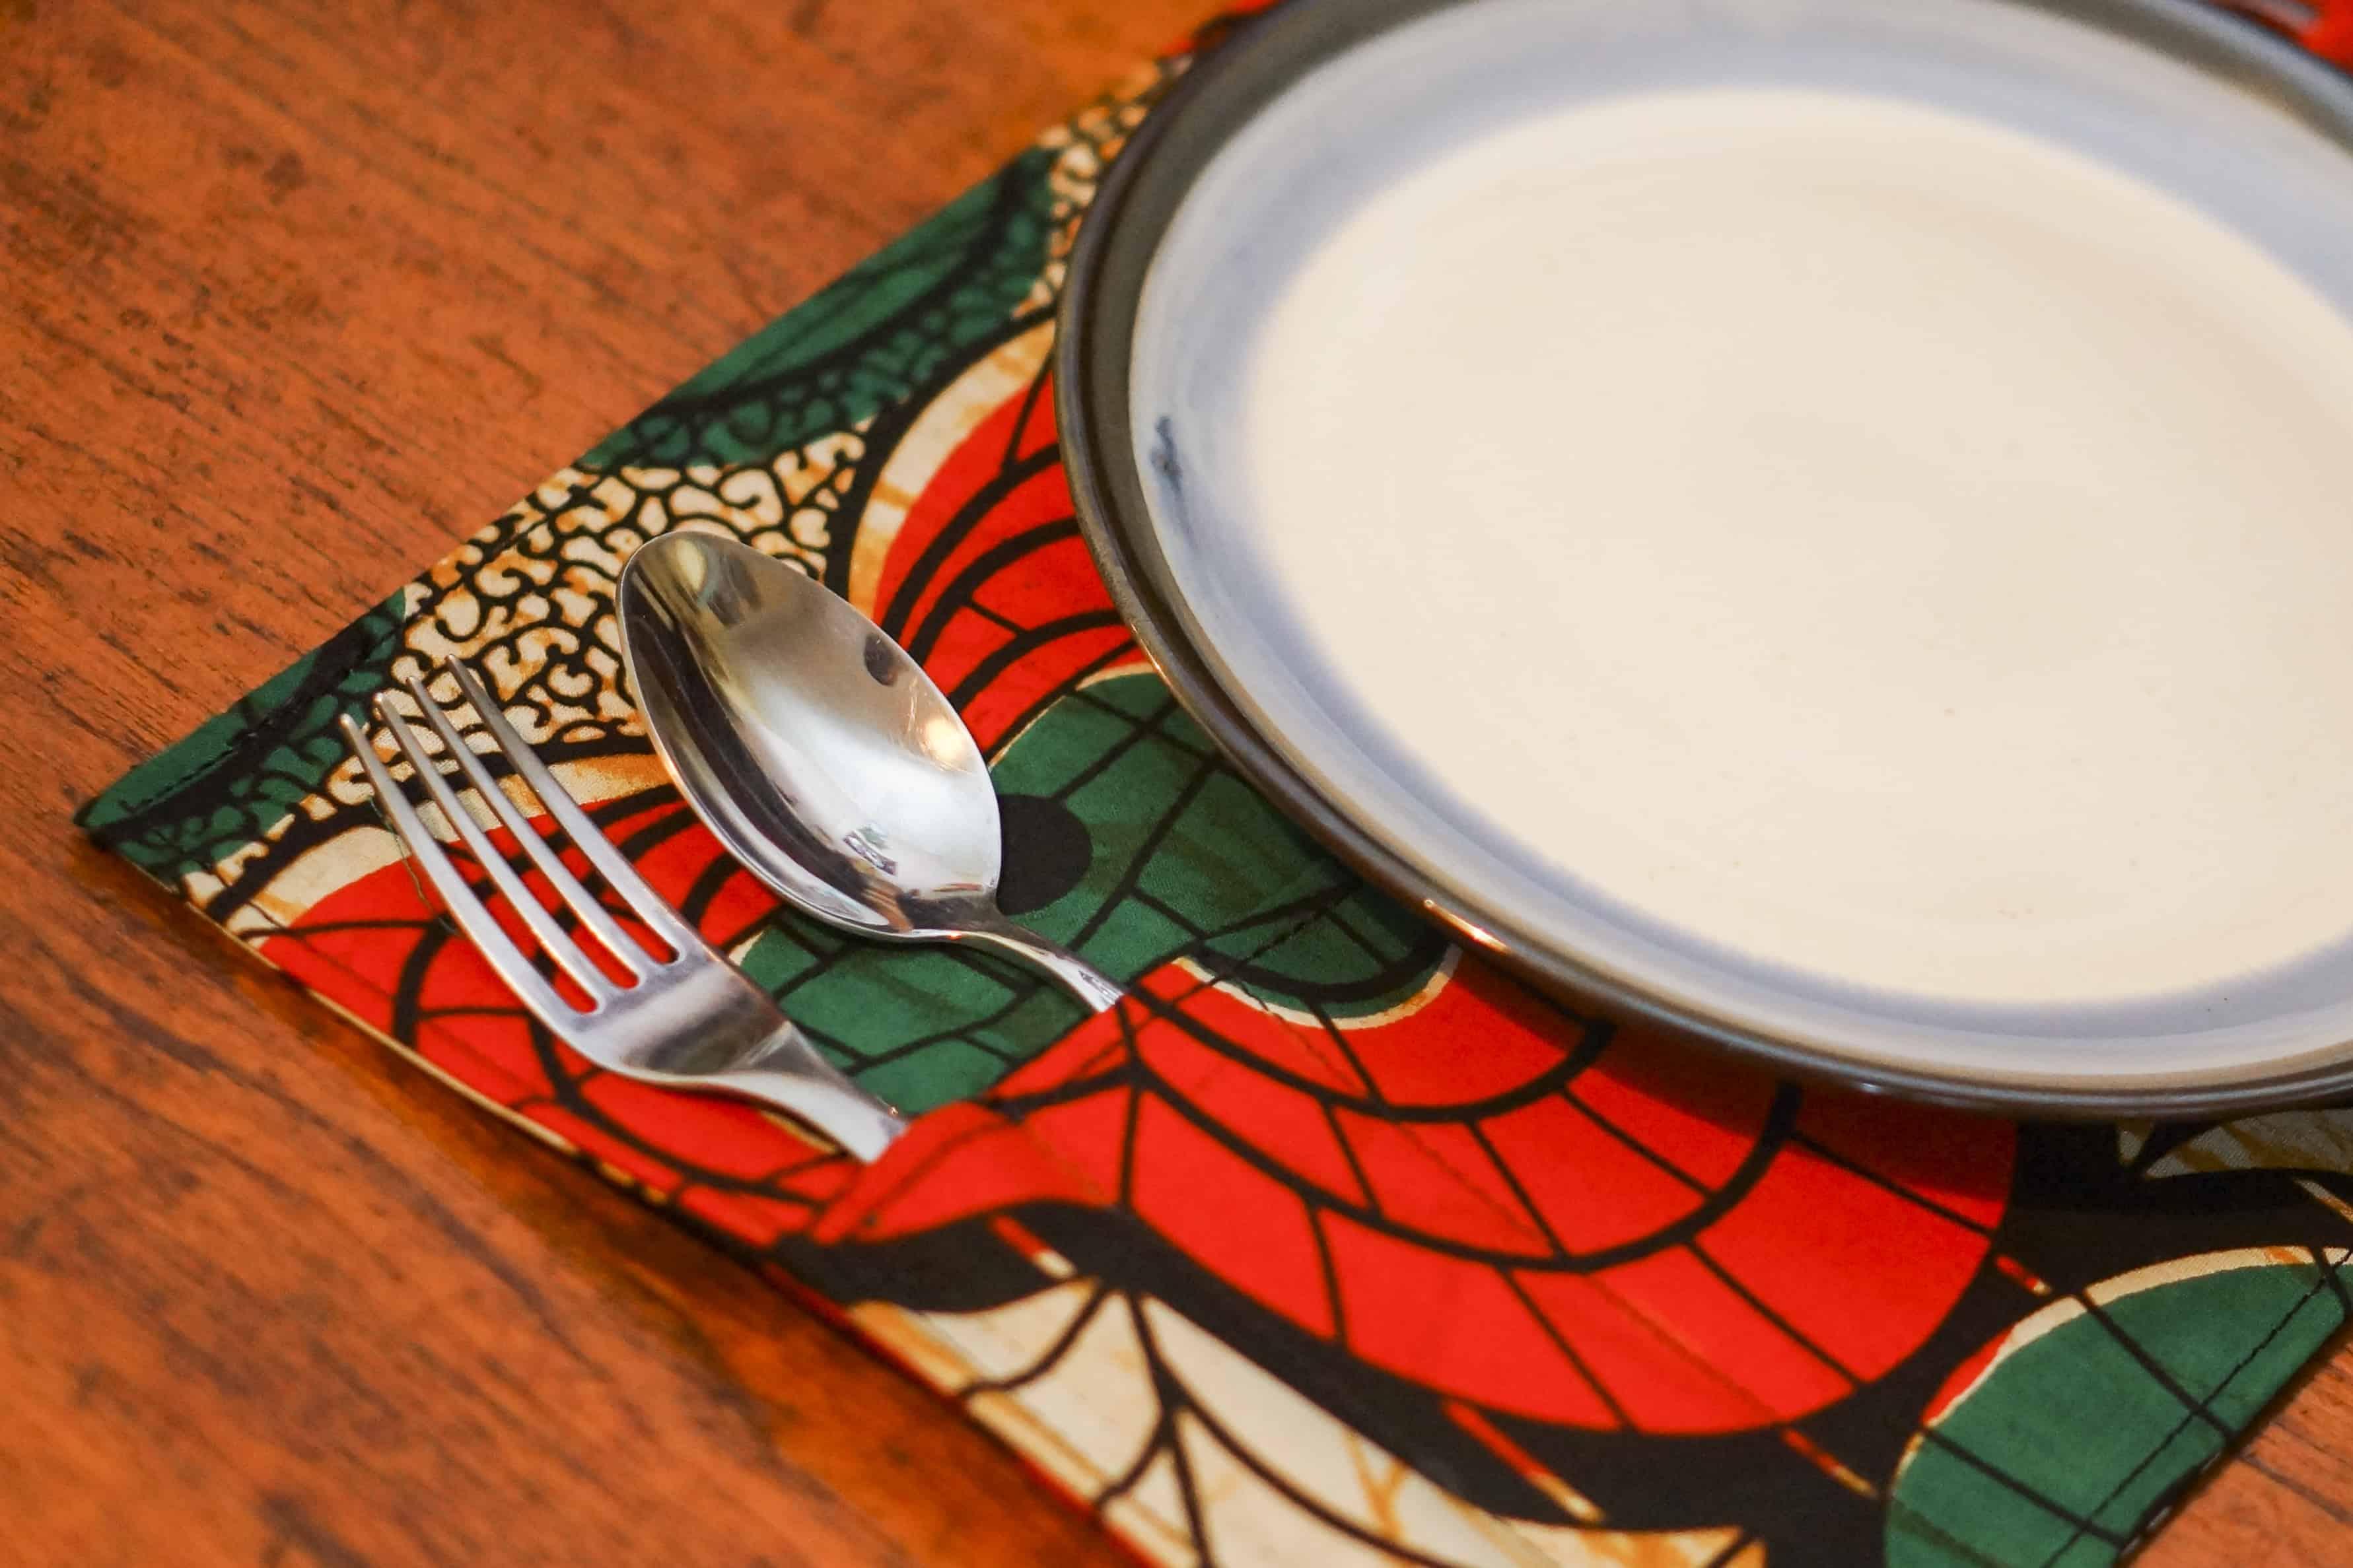 Custom made table cutlery sets